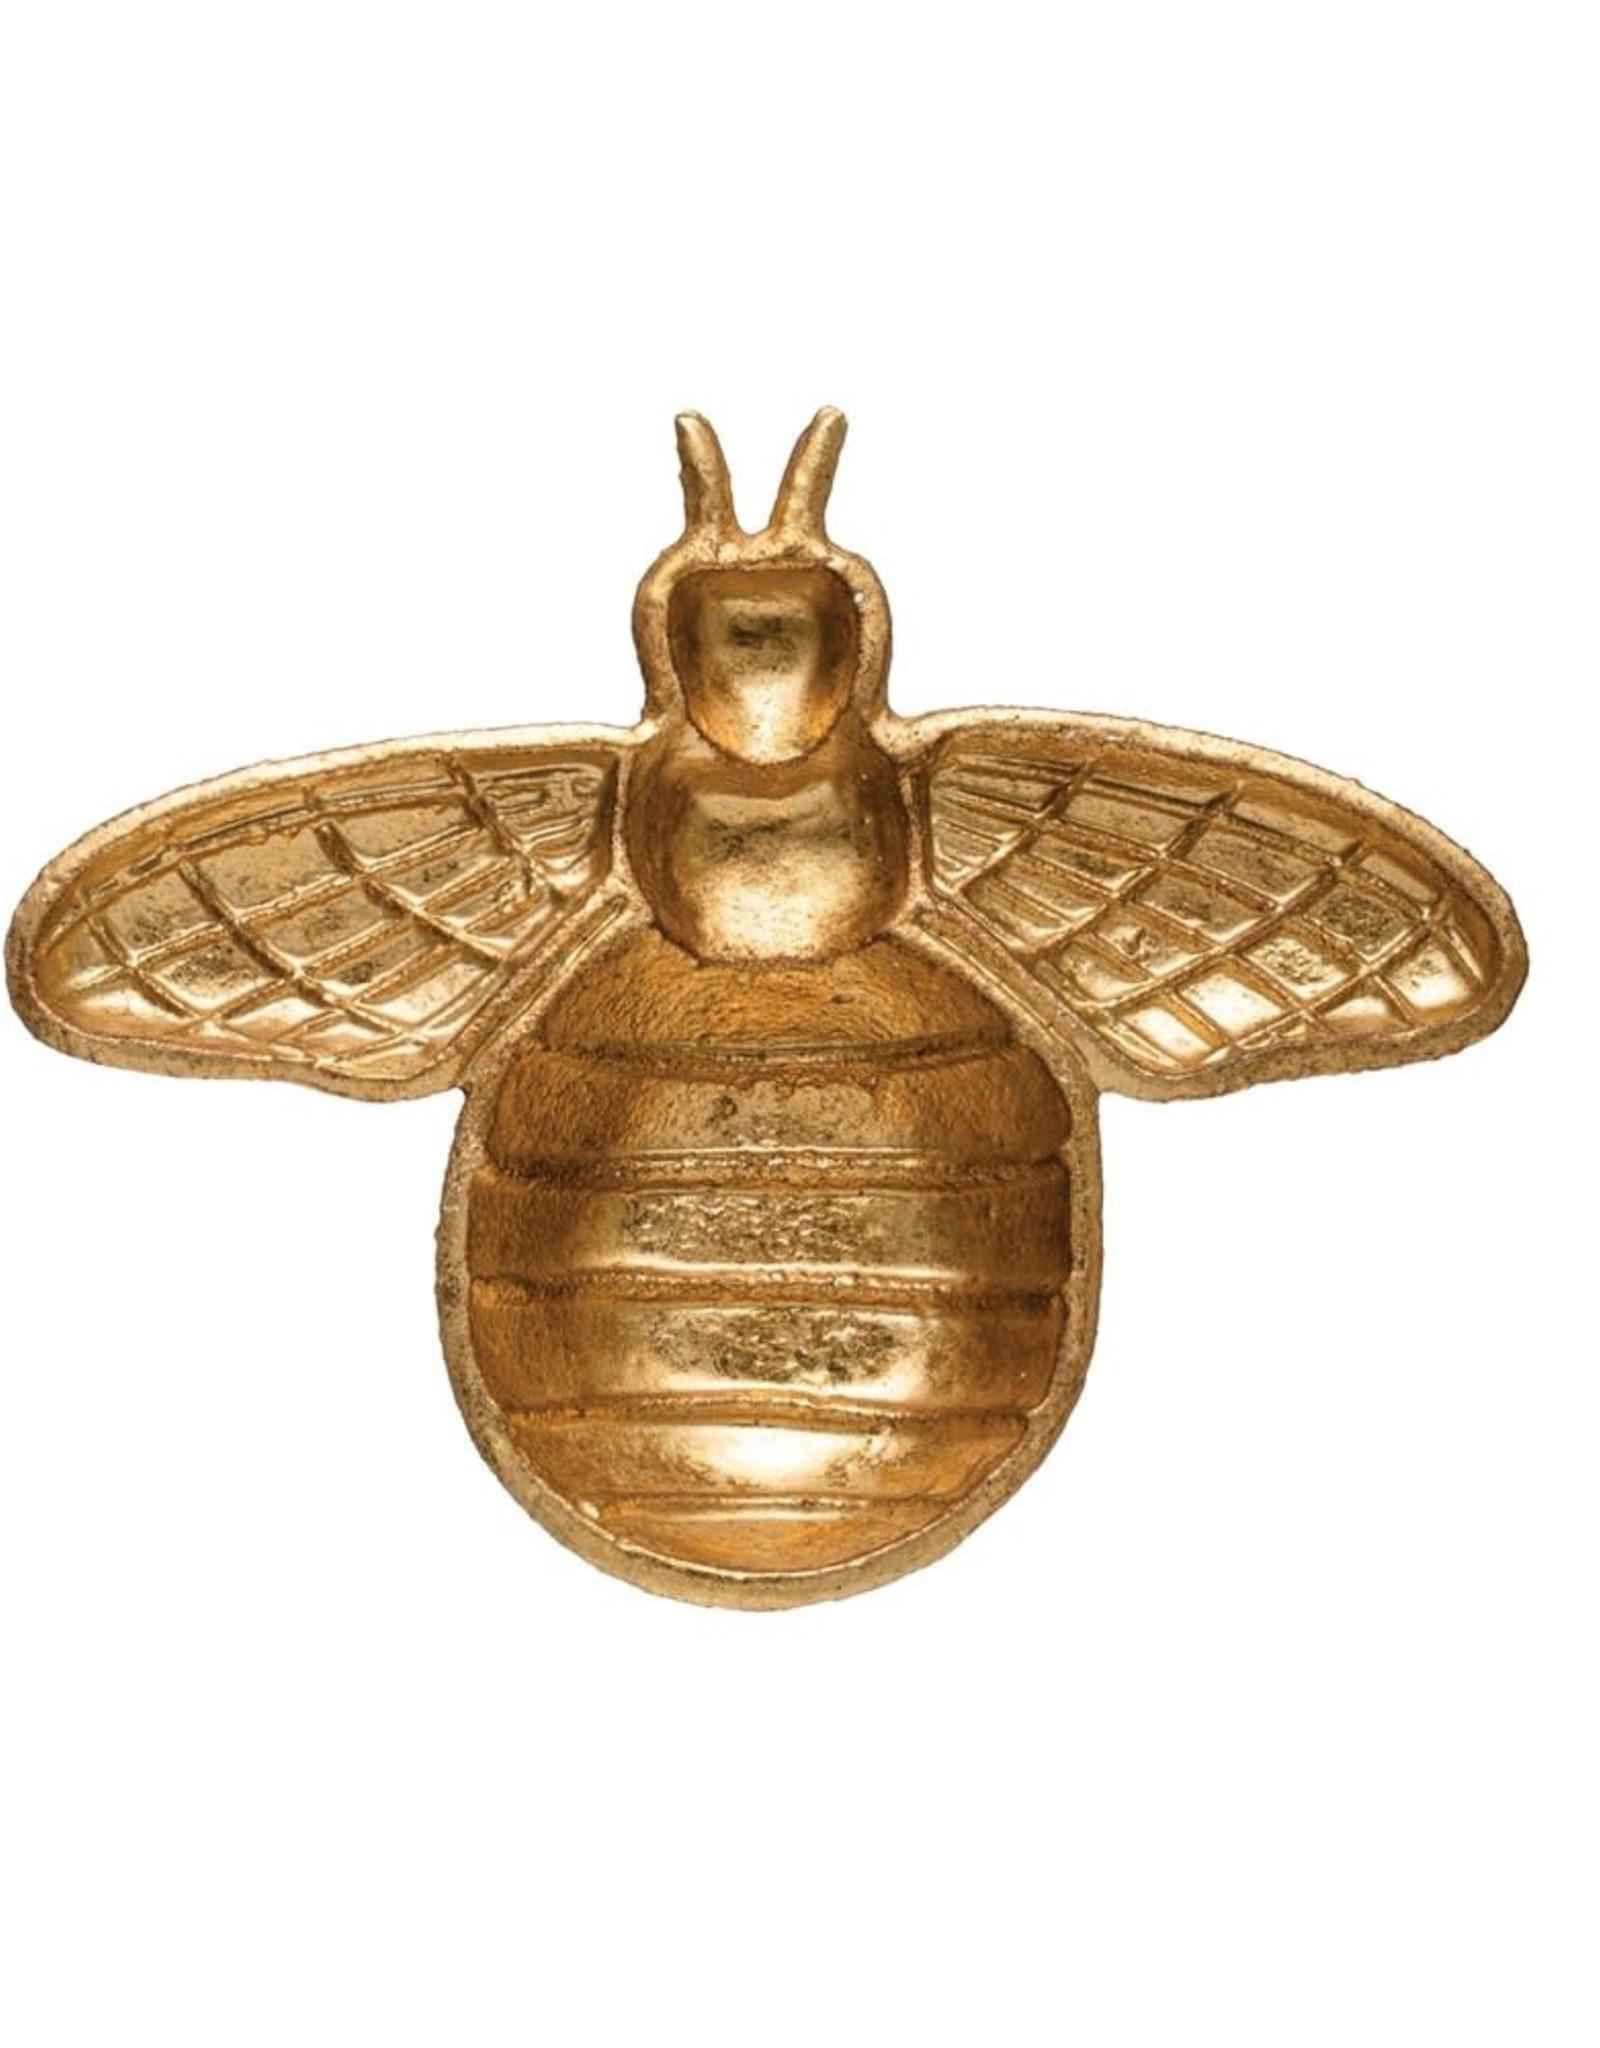 Wink Cast Iron Bee Dish